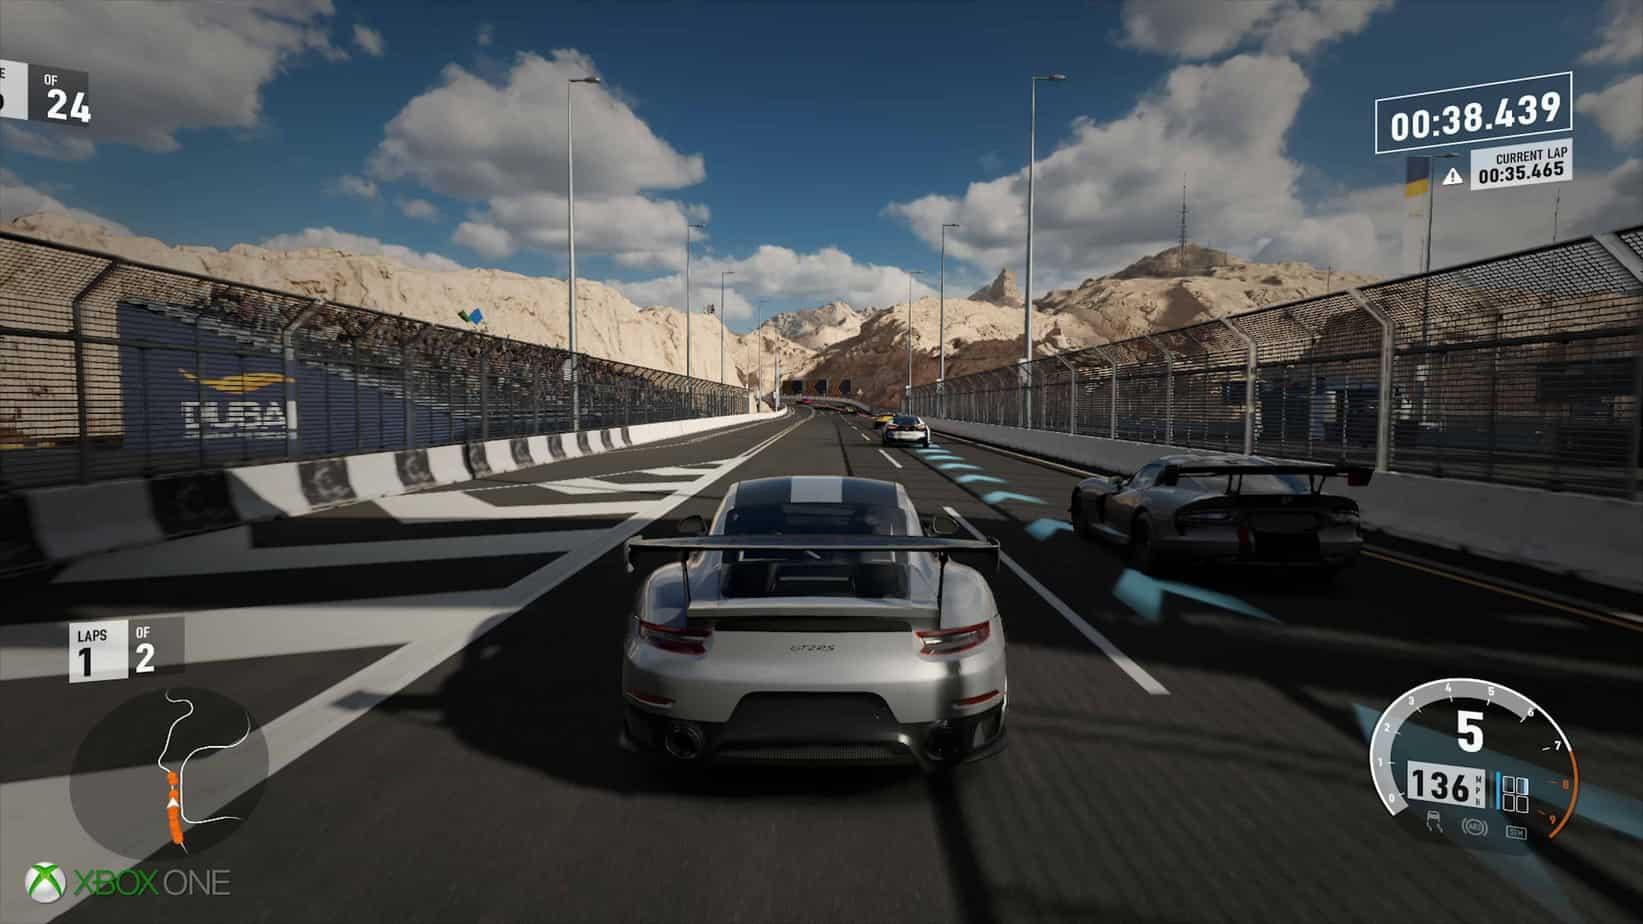 Forza 7 on Xbox One